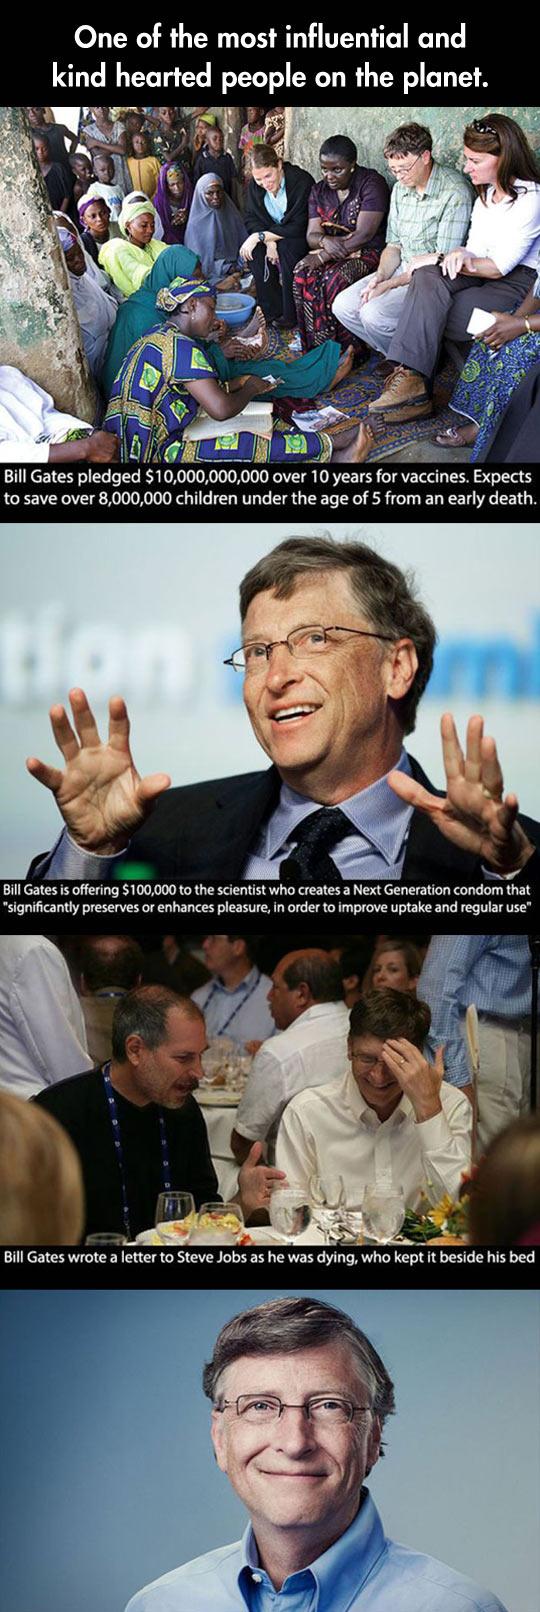 cool-Bill-Gates-poor-people-kind